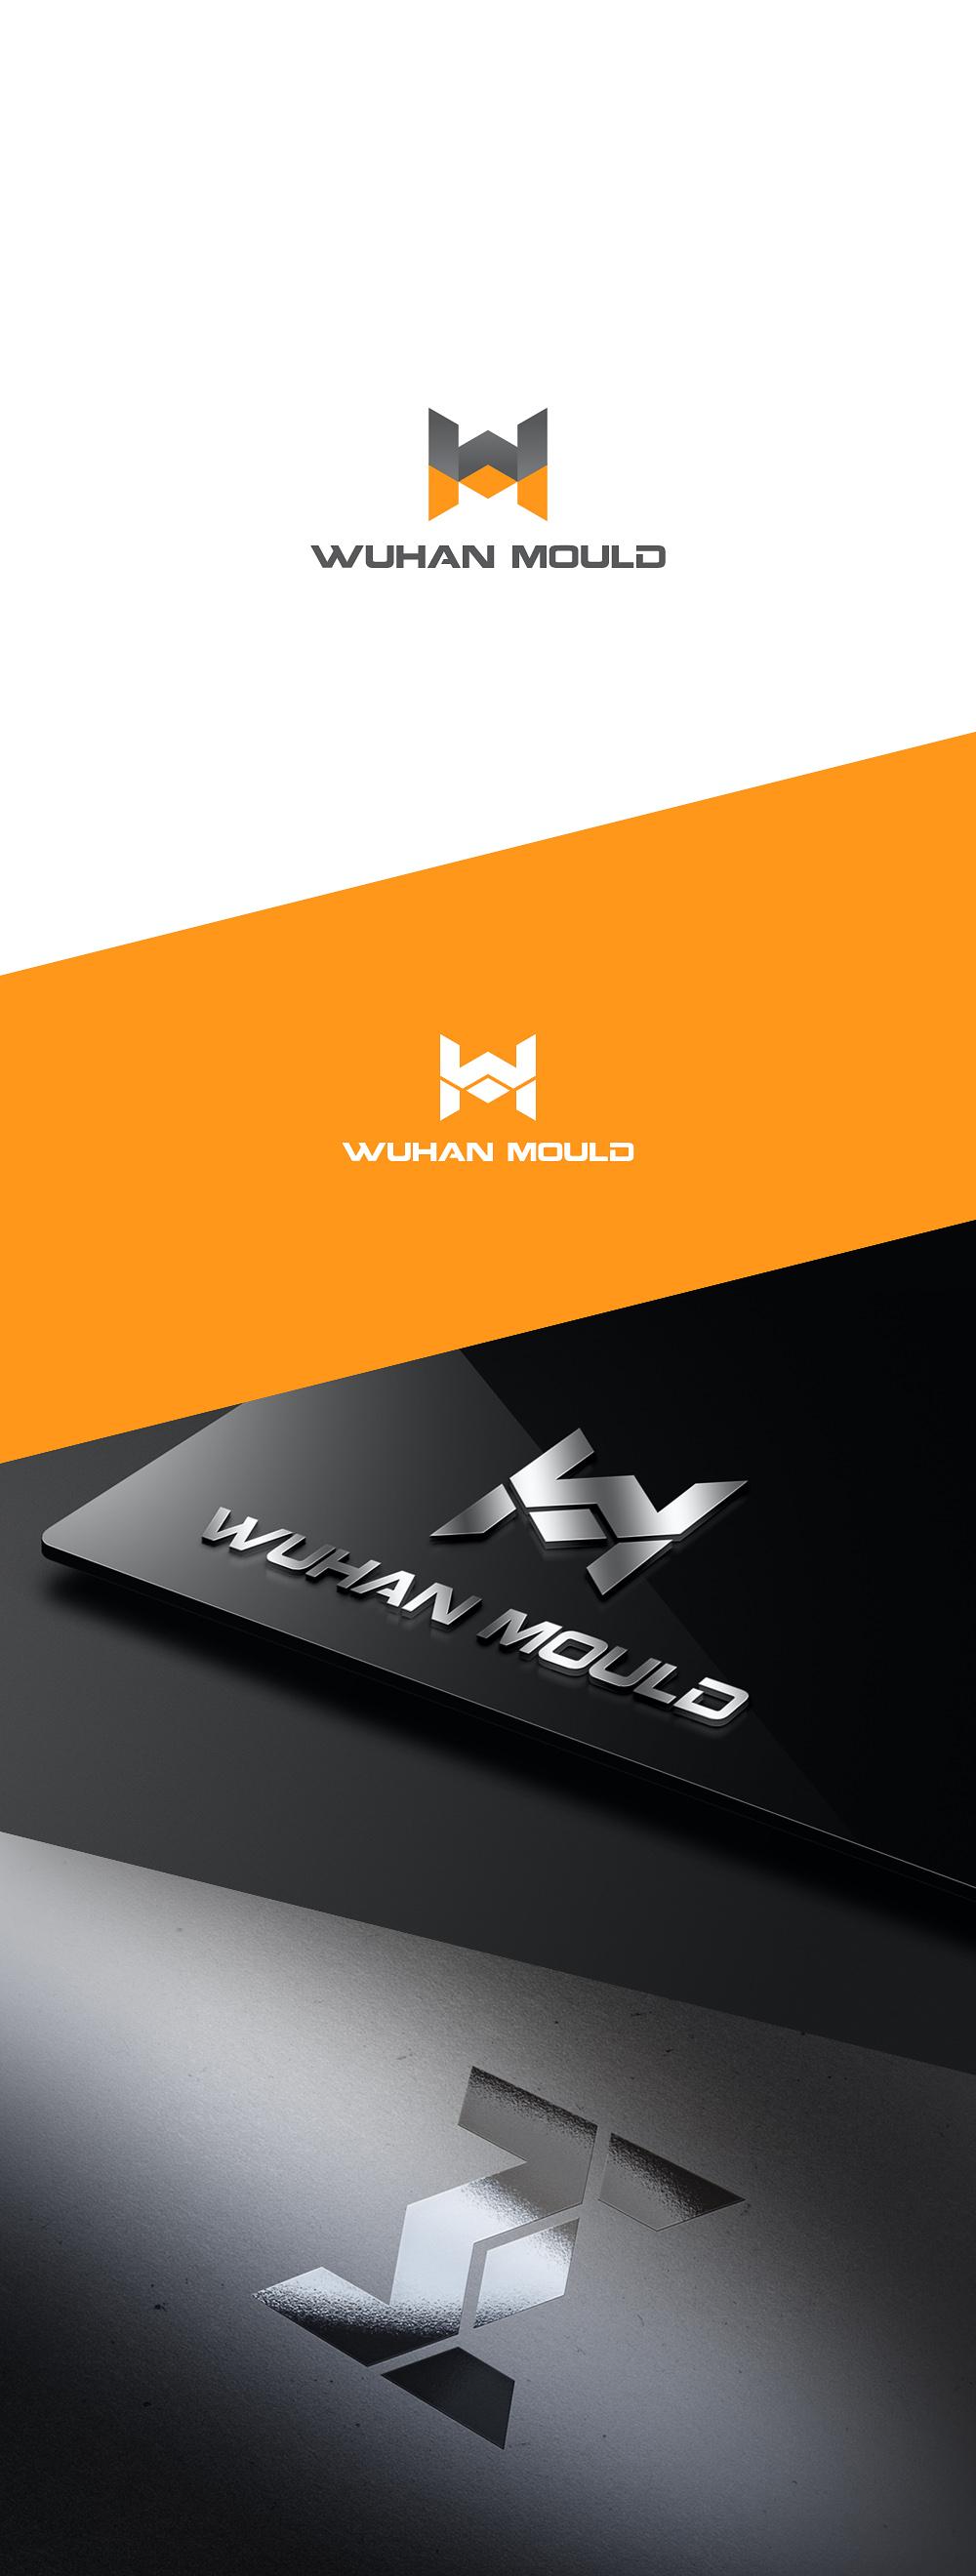 Создать логотип для фабрики пресс-форм фото f_211598ae048e375a.jpg